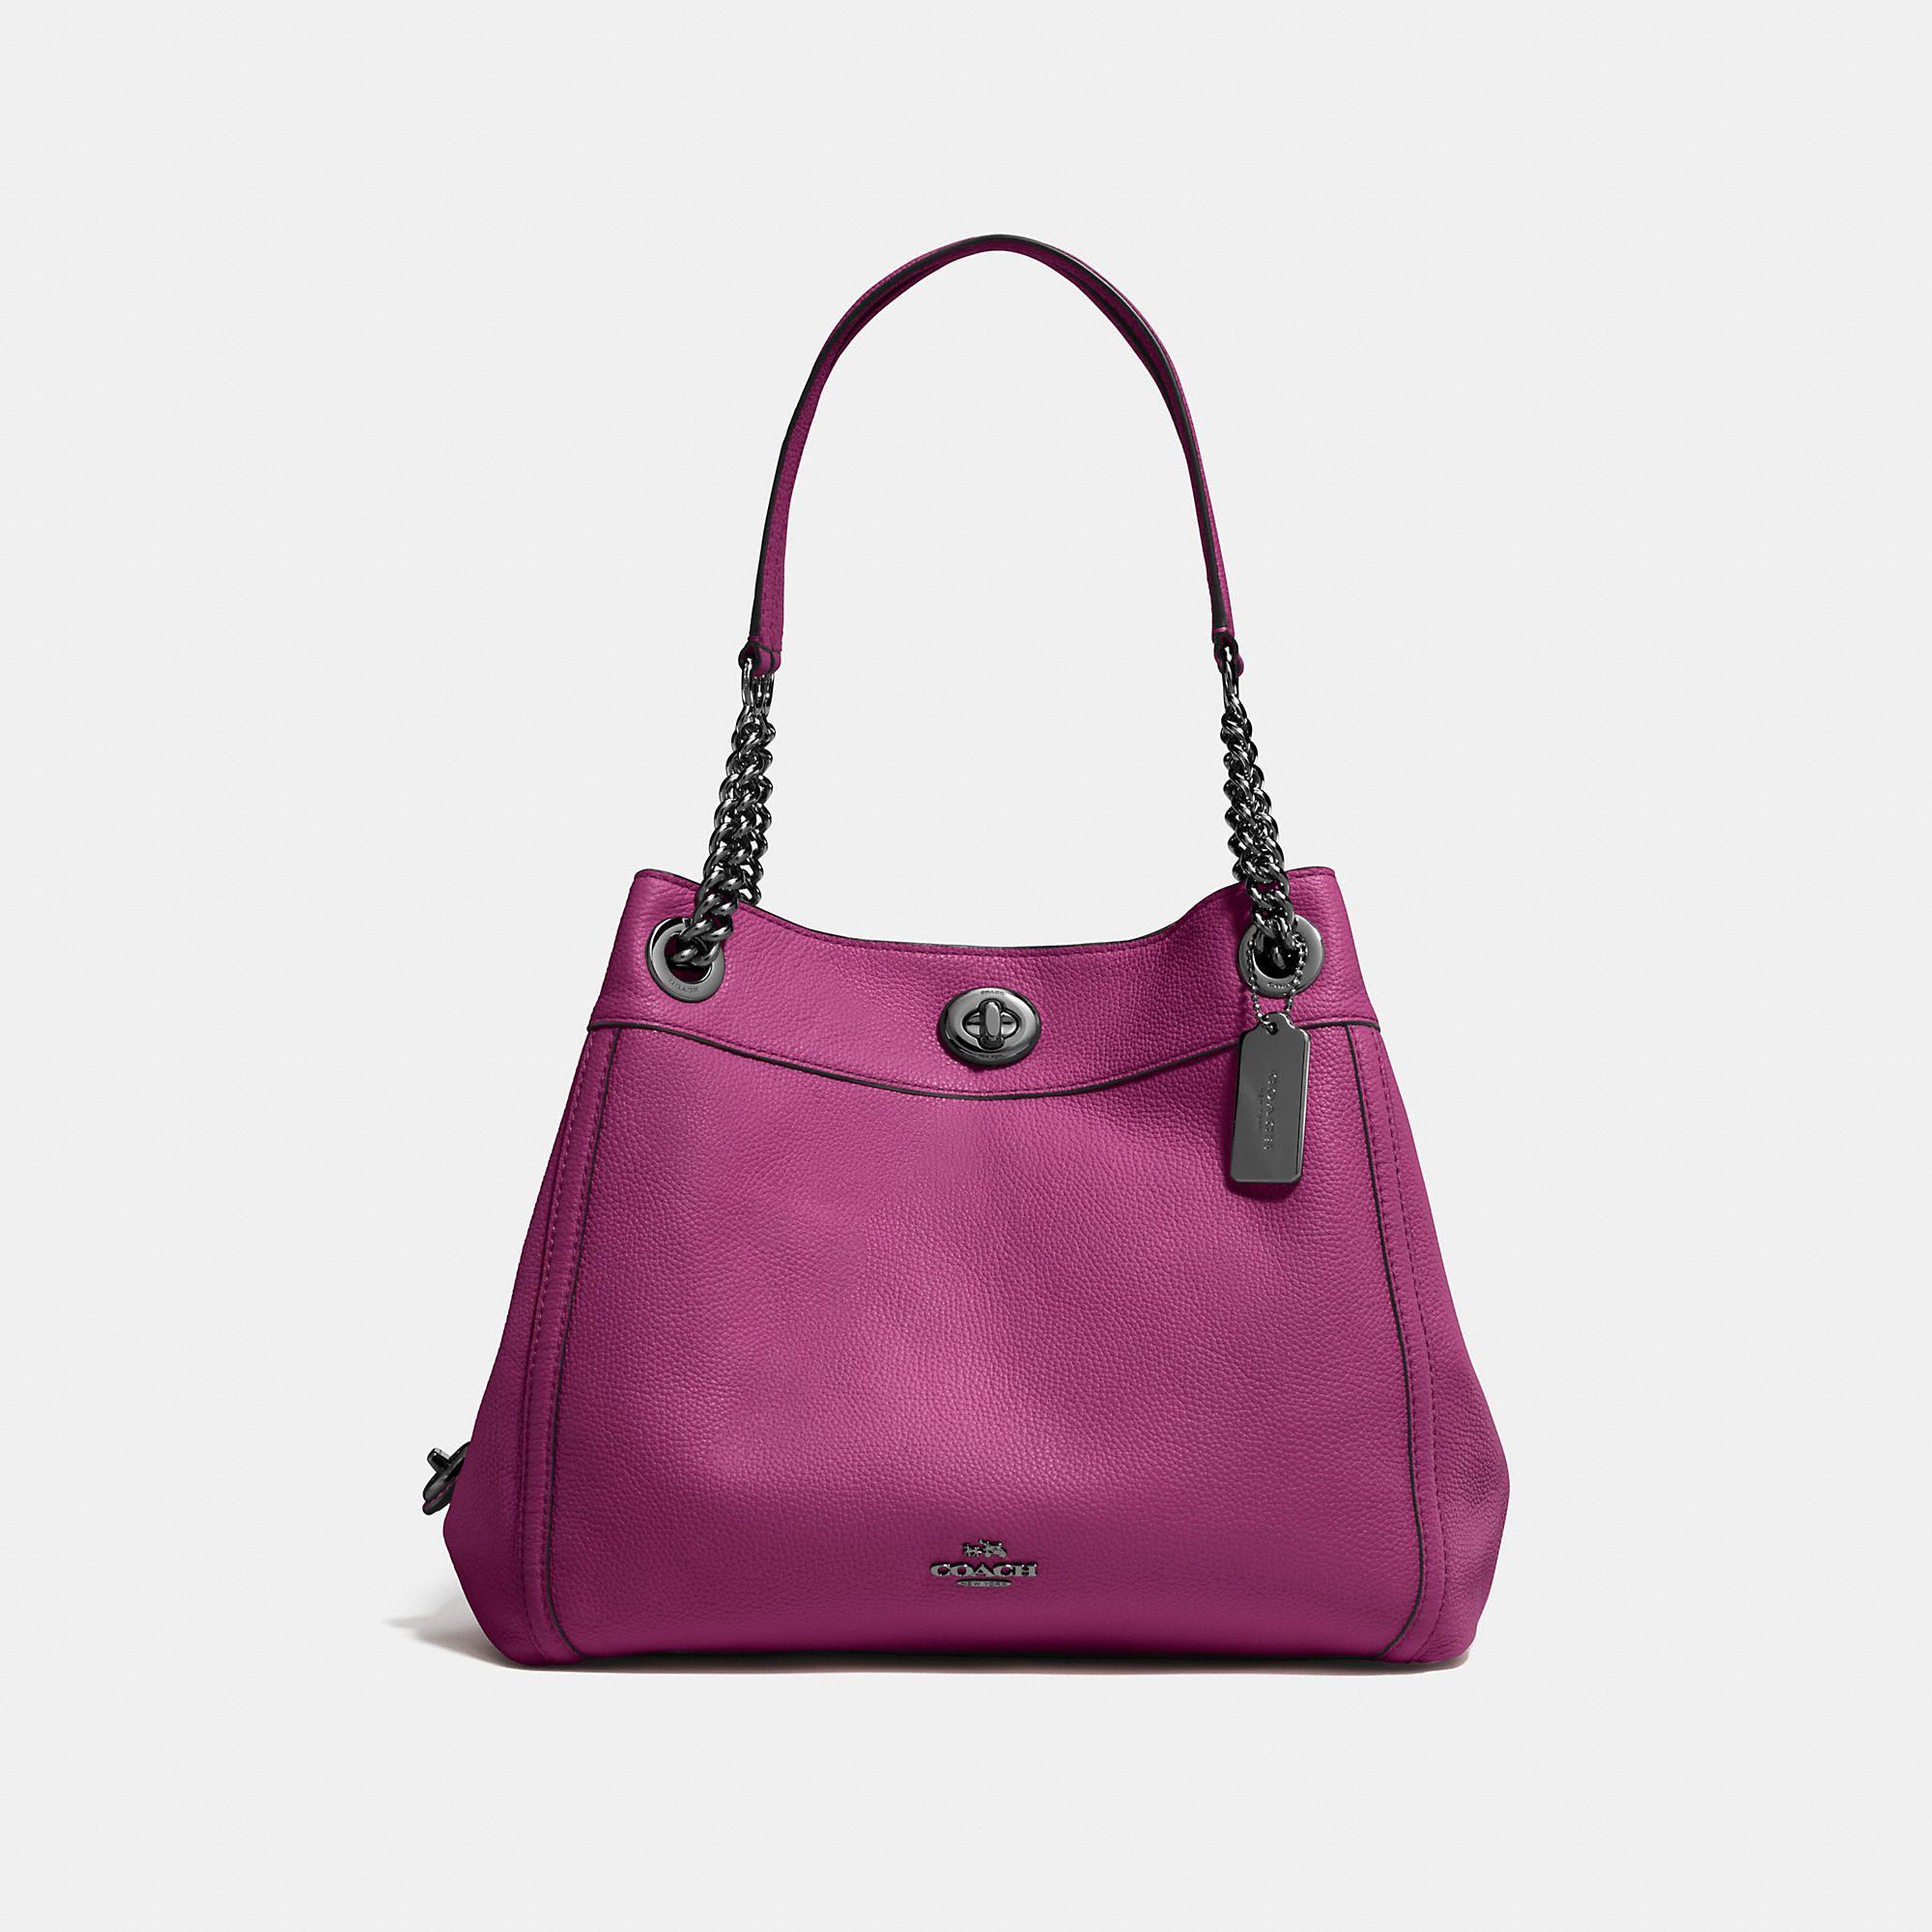 45f09512c6b1 COACH Turnlock Edie Shoulder Bag - Women s Purses